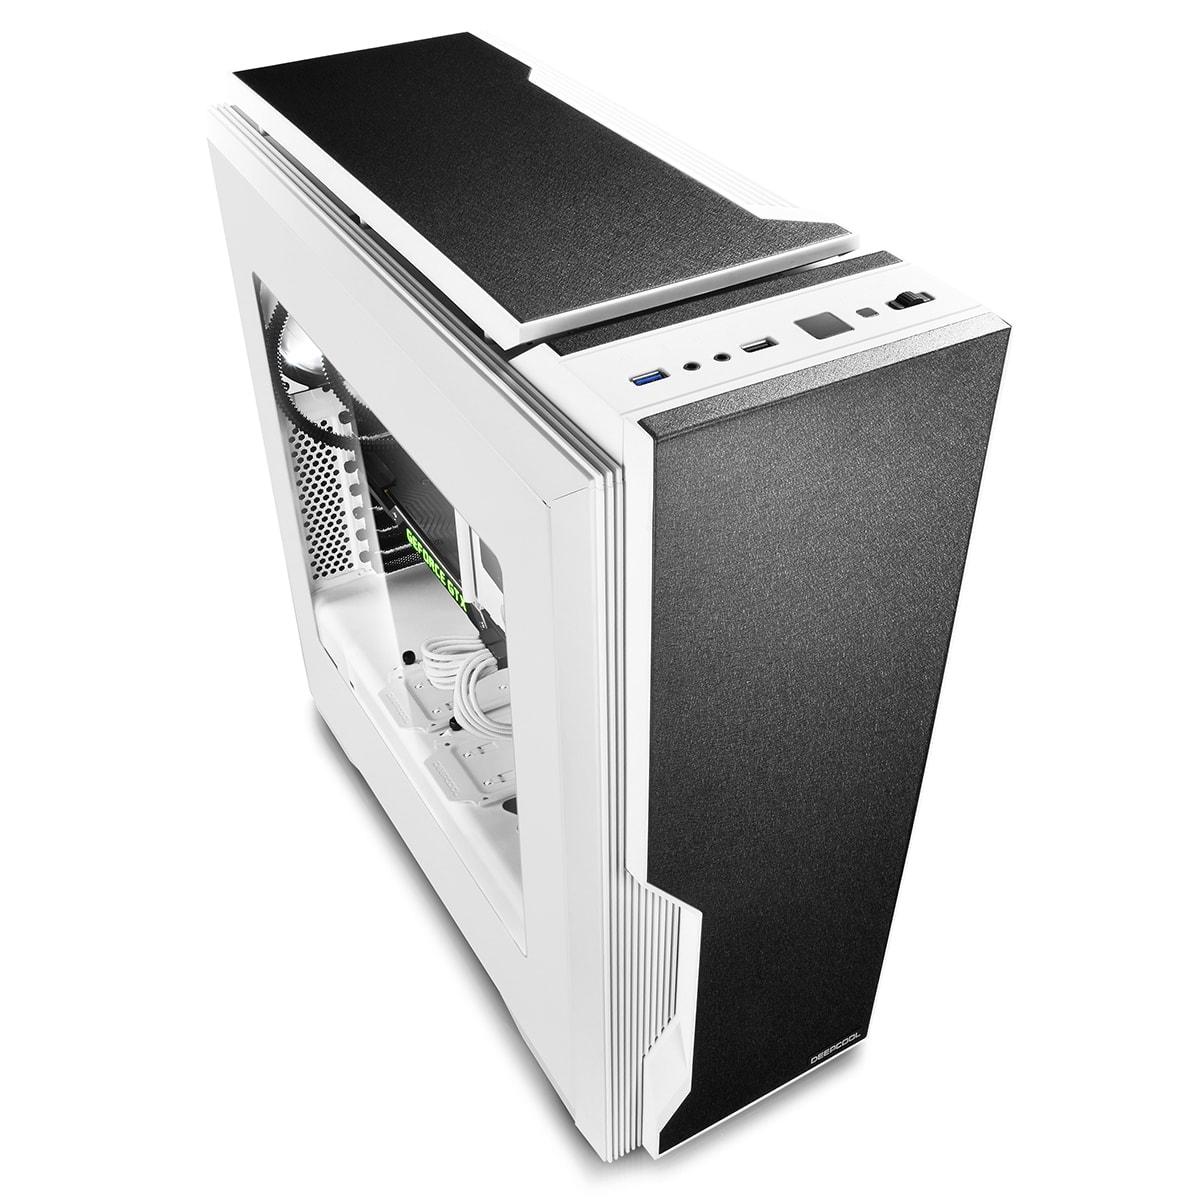 Deepcool DUKASE V2 Blanc - mT/Ss Alim/ATX (DUKASE WHV2) - Achat / Vente Boîtier PC sur Cybertek.fr - 2